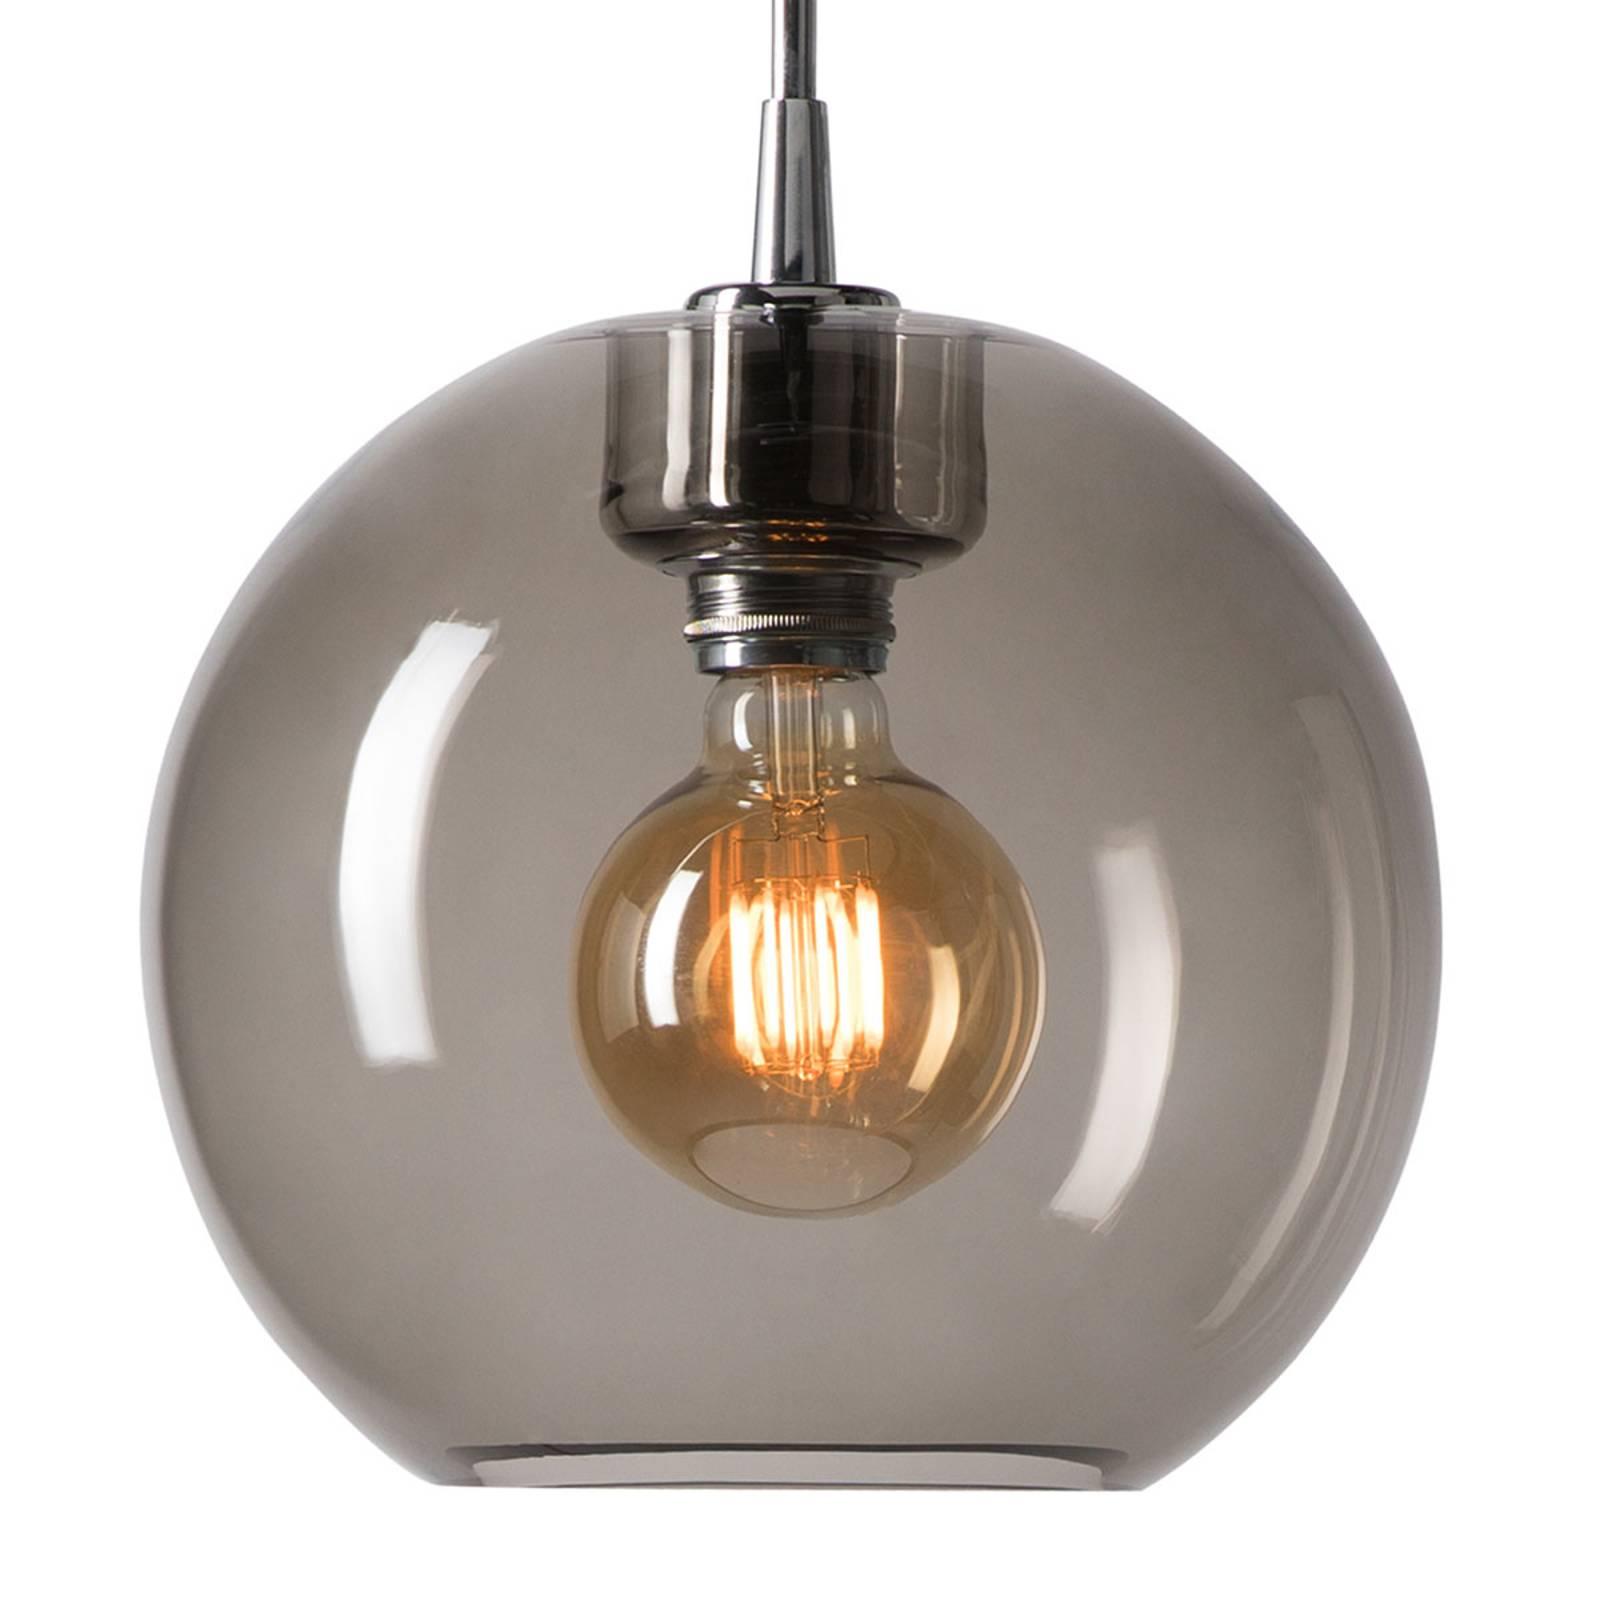 Hanglamp Gloria chroom/rookglas Ø 26 cm